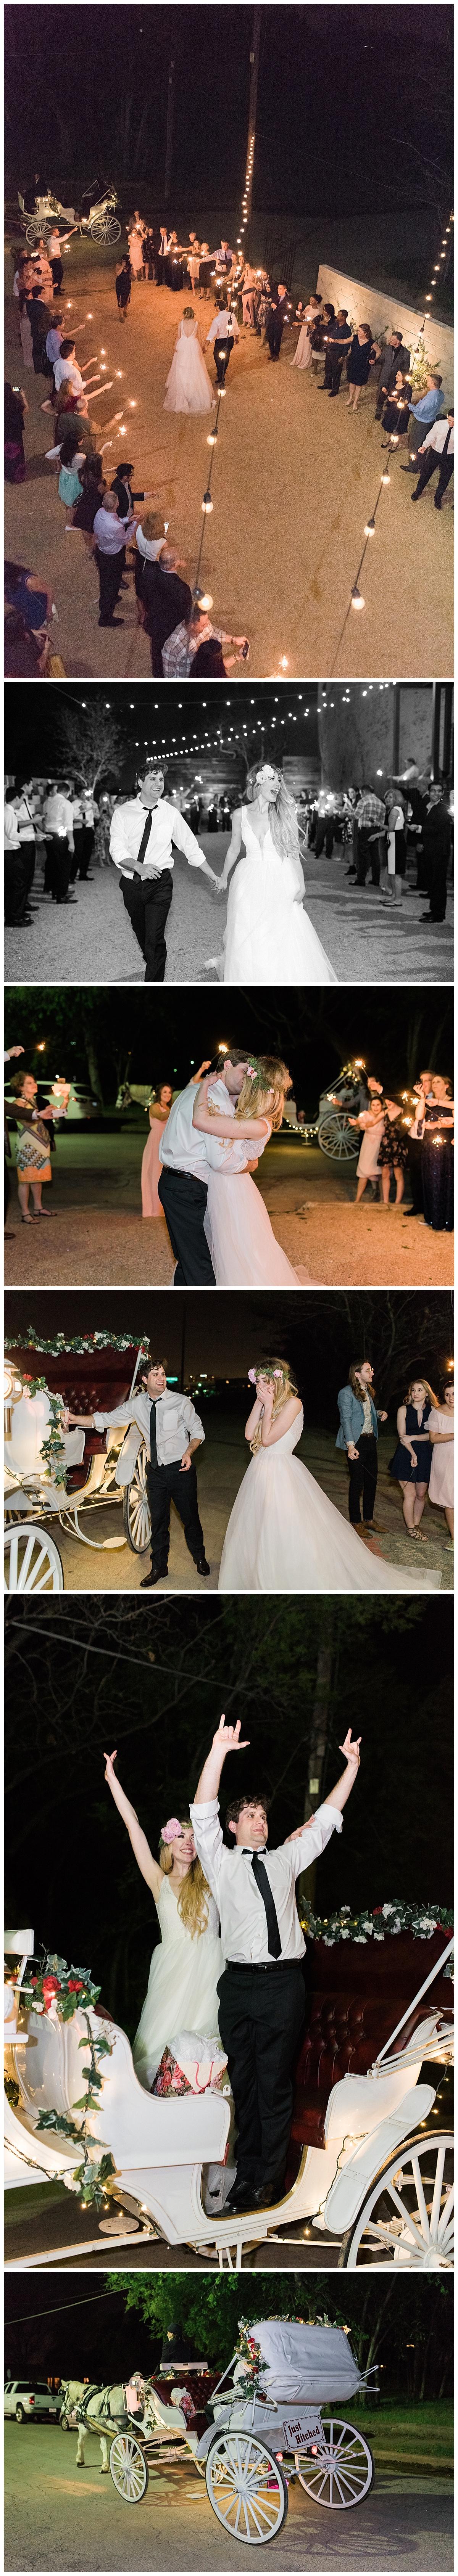 brik-venue-wedding-ar-photography-8.jpg